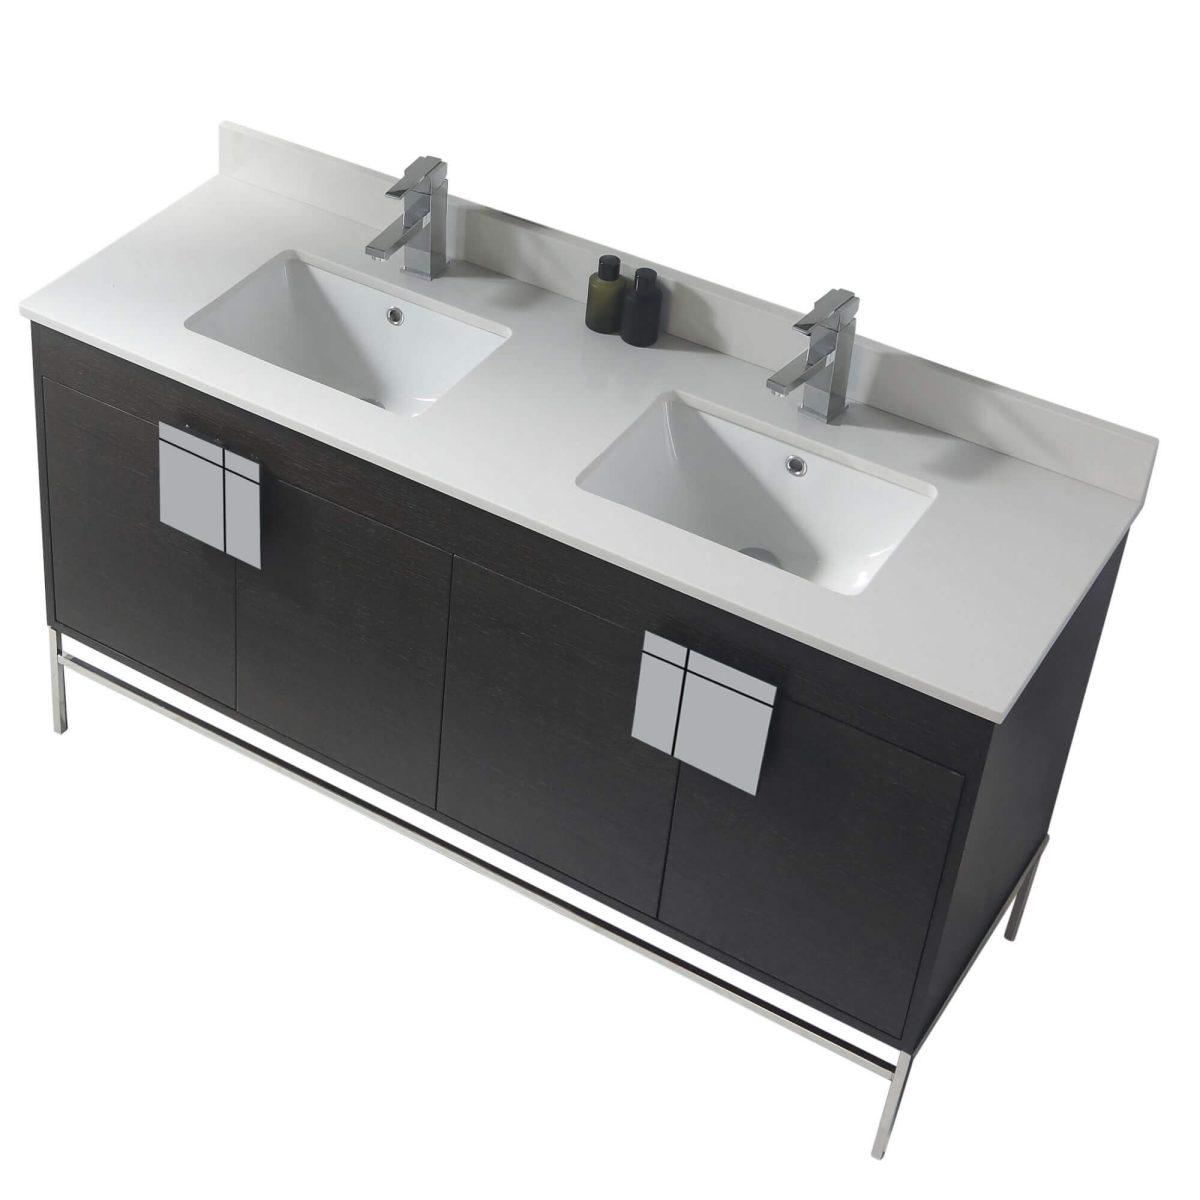 "Shawbridge 60"" Modern Double Bathroom Vanity  Black Oak Straight Grain with Polished Chrome Hardware"